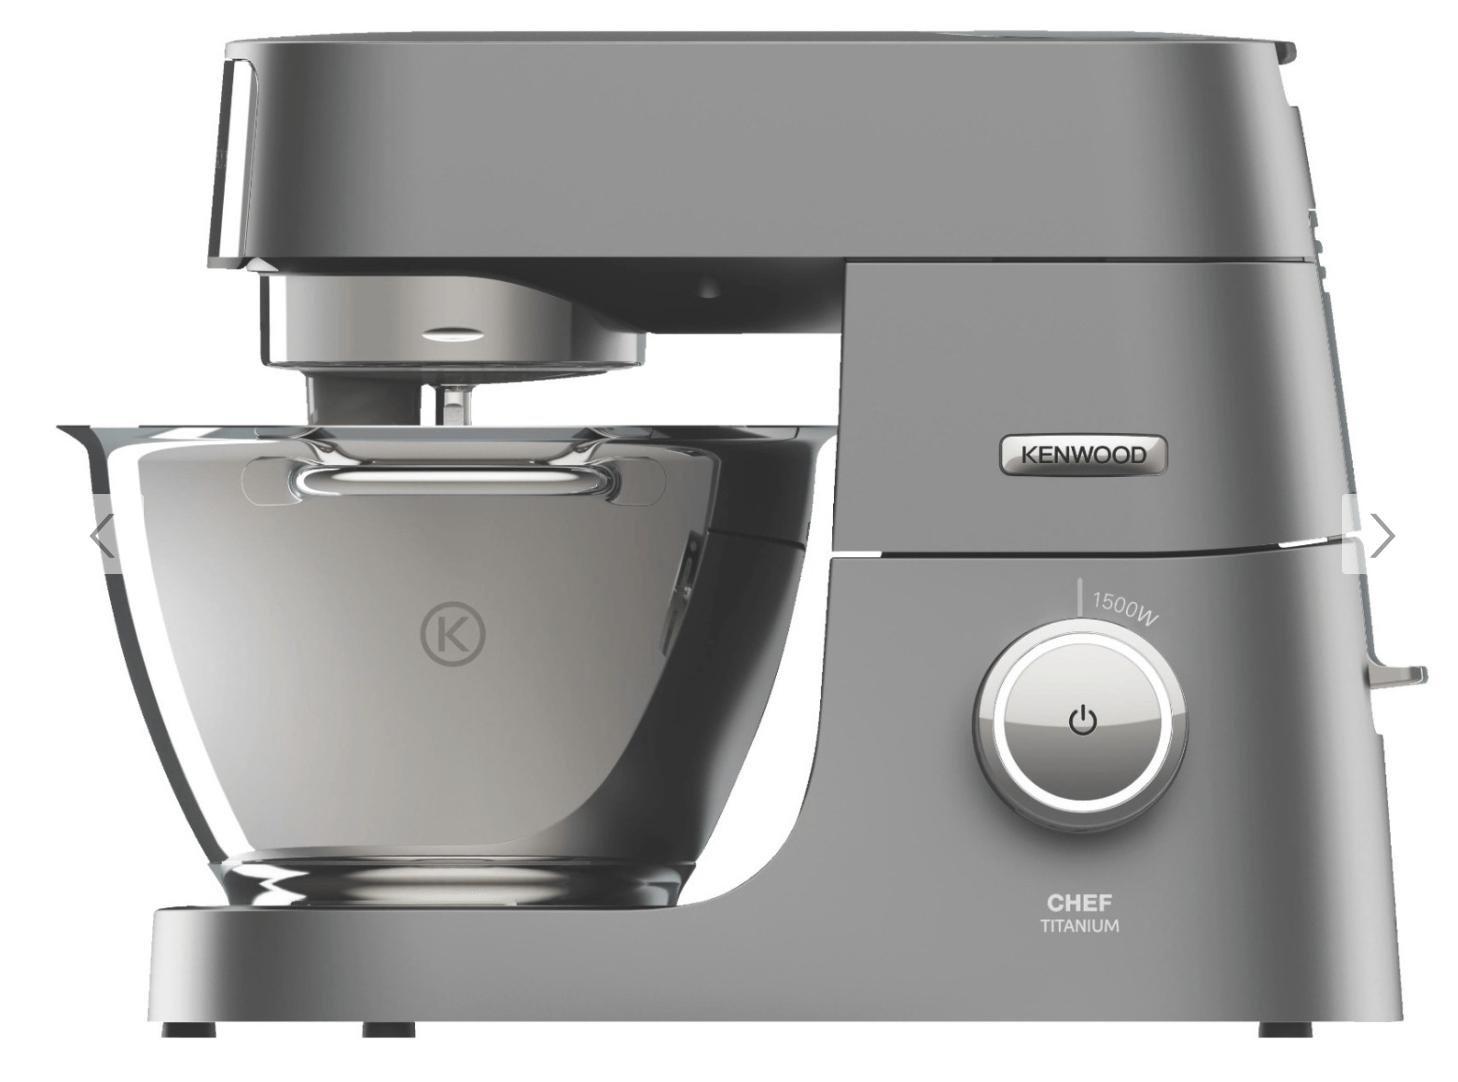 (Saturn Köln Hohestraße) Kenwood Titanium Chef System Pro KVC 7350 S incl. Ice Cream Maker